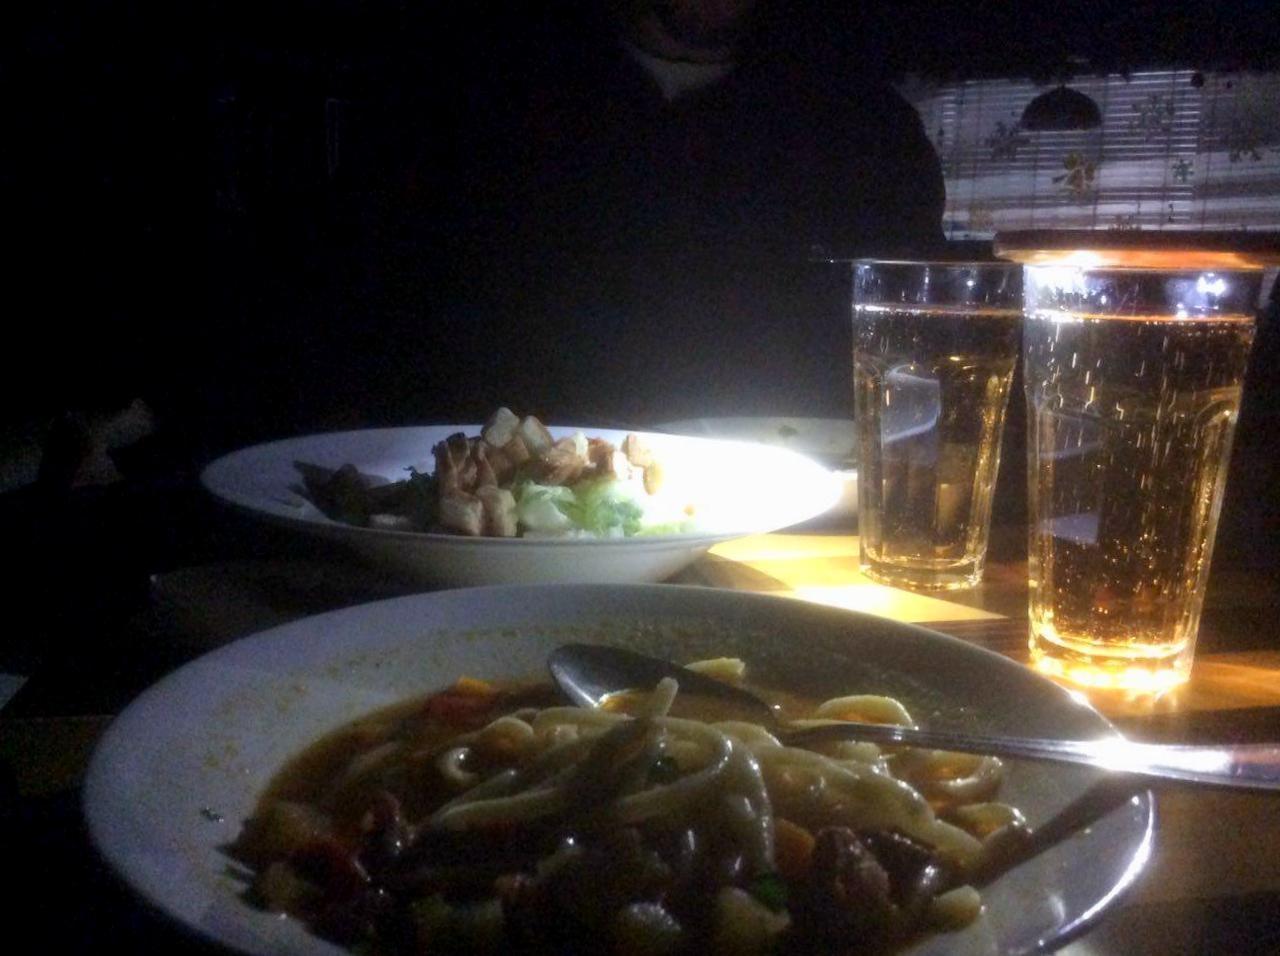 Обед превратился в романтический ужин при фонариках